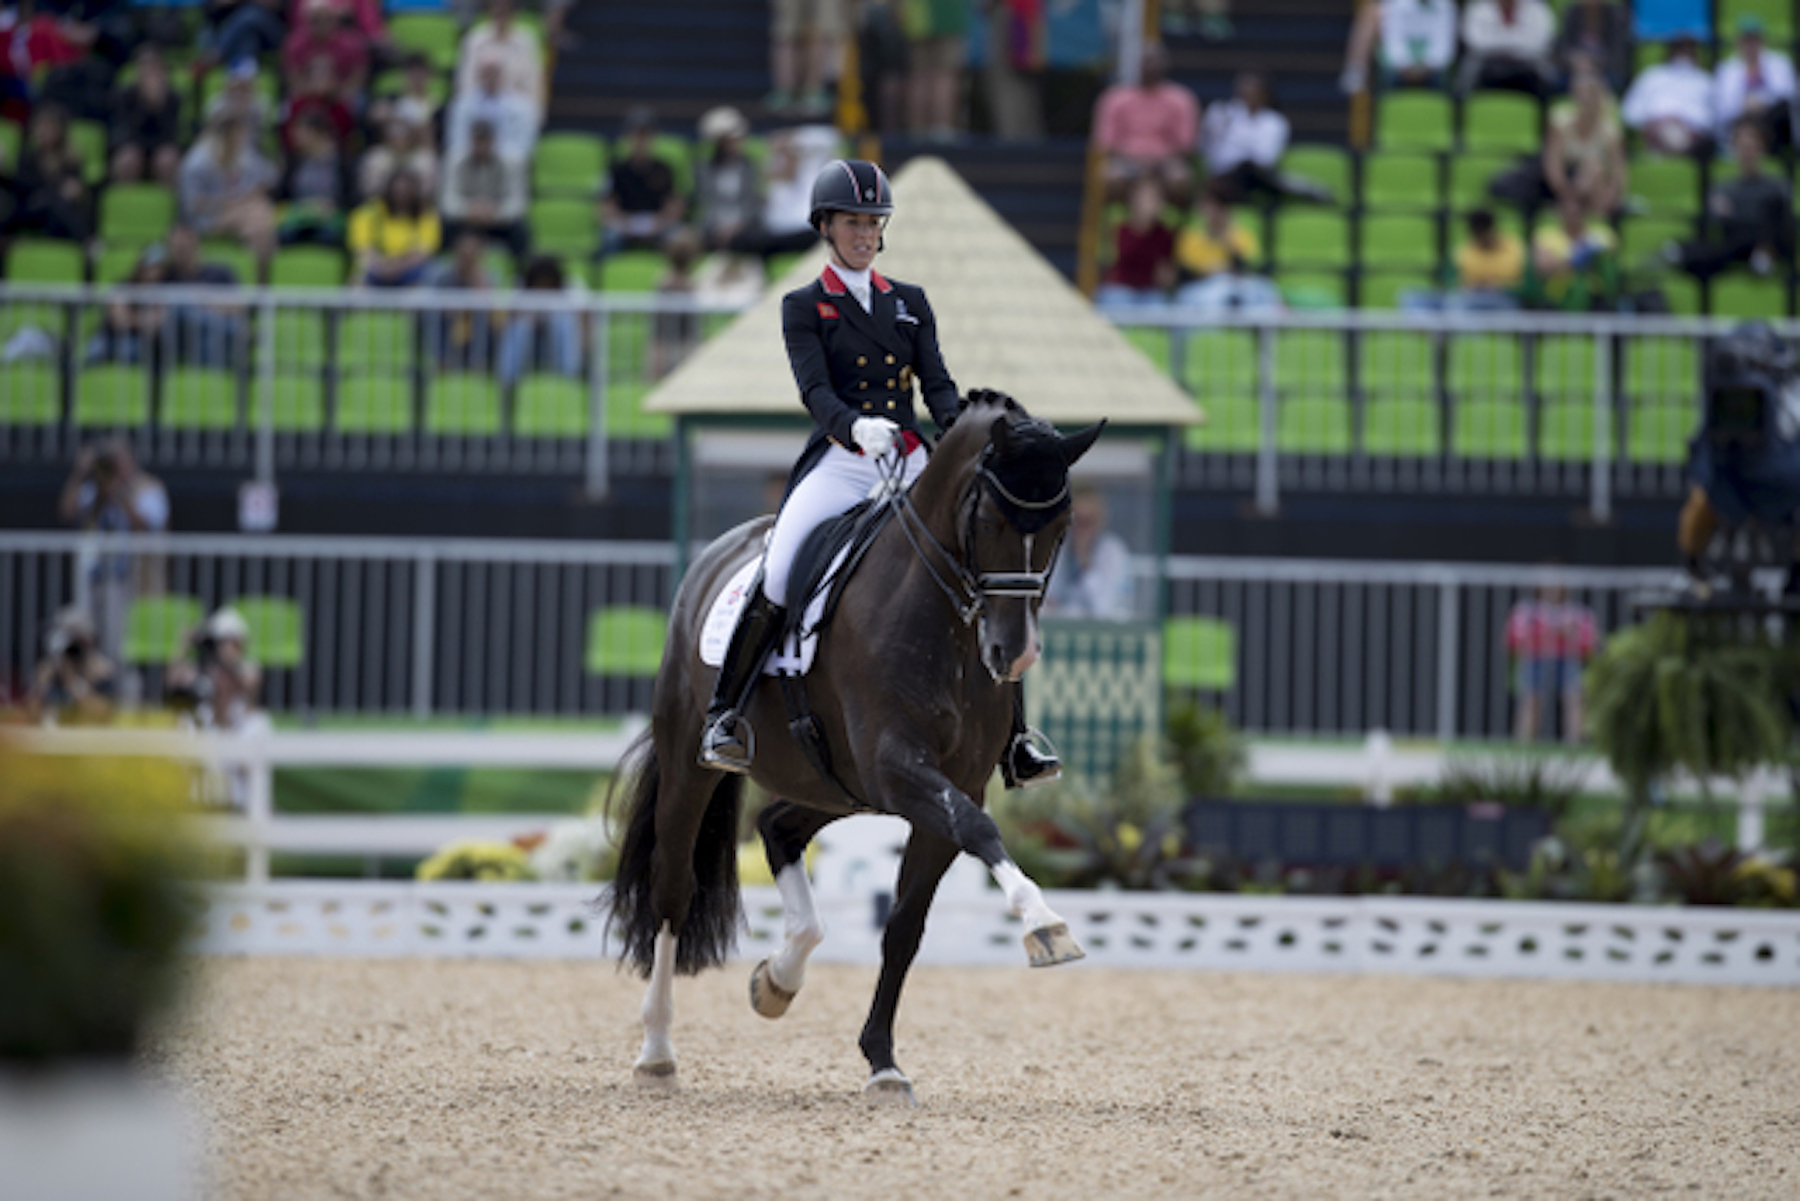 Rio olympics dressage day 2 the gaitpost for Dujardin richard